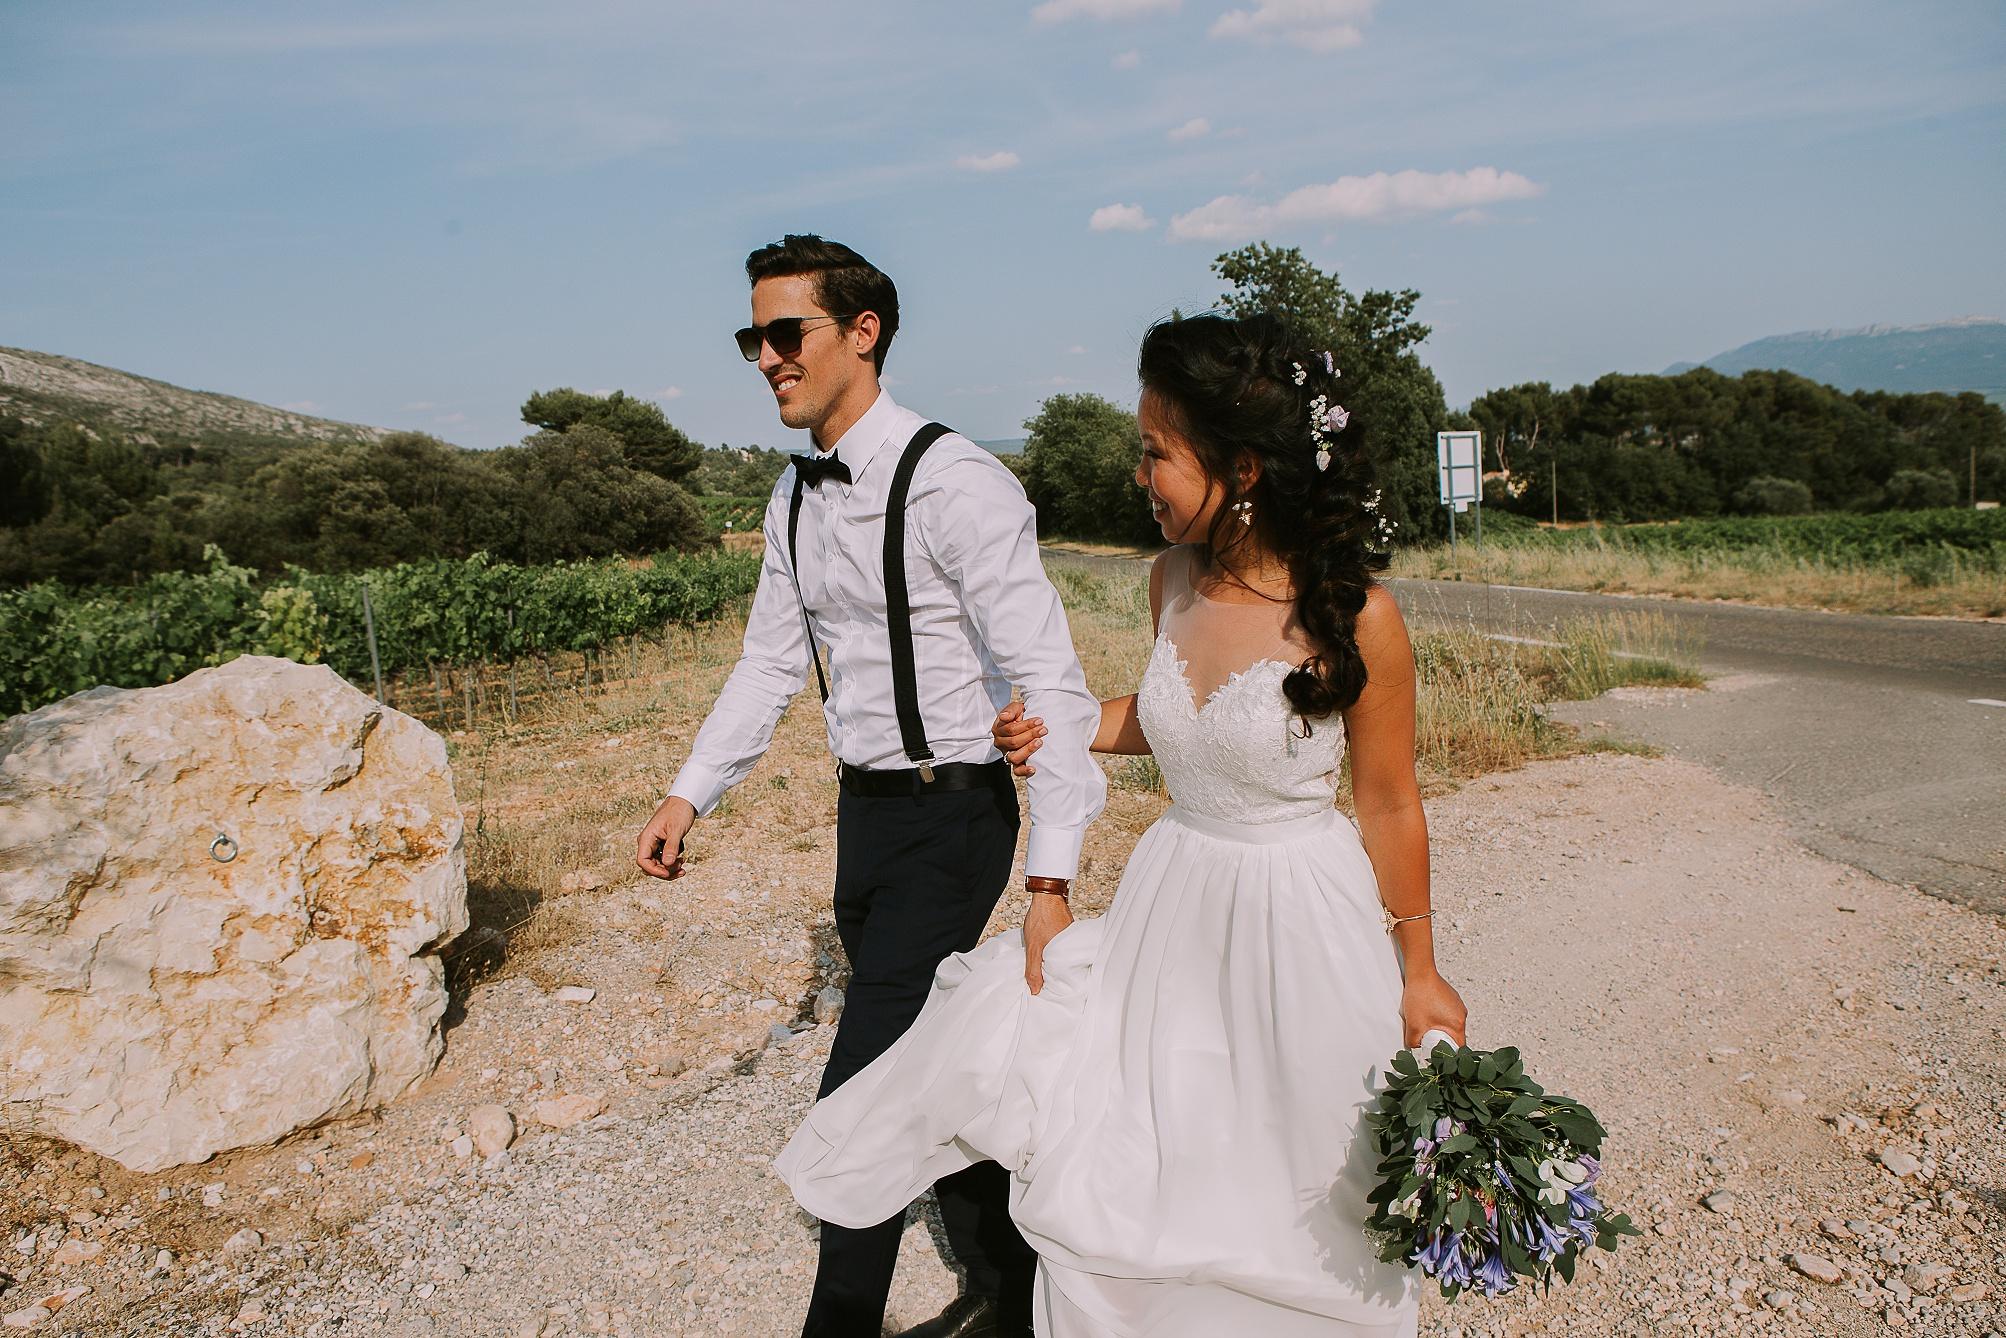 katerynaphotos-mariage-photographe-puyloubier-provence-aix-en-provence-sud-de-la-france_0397.jpg